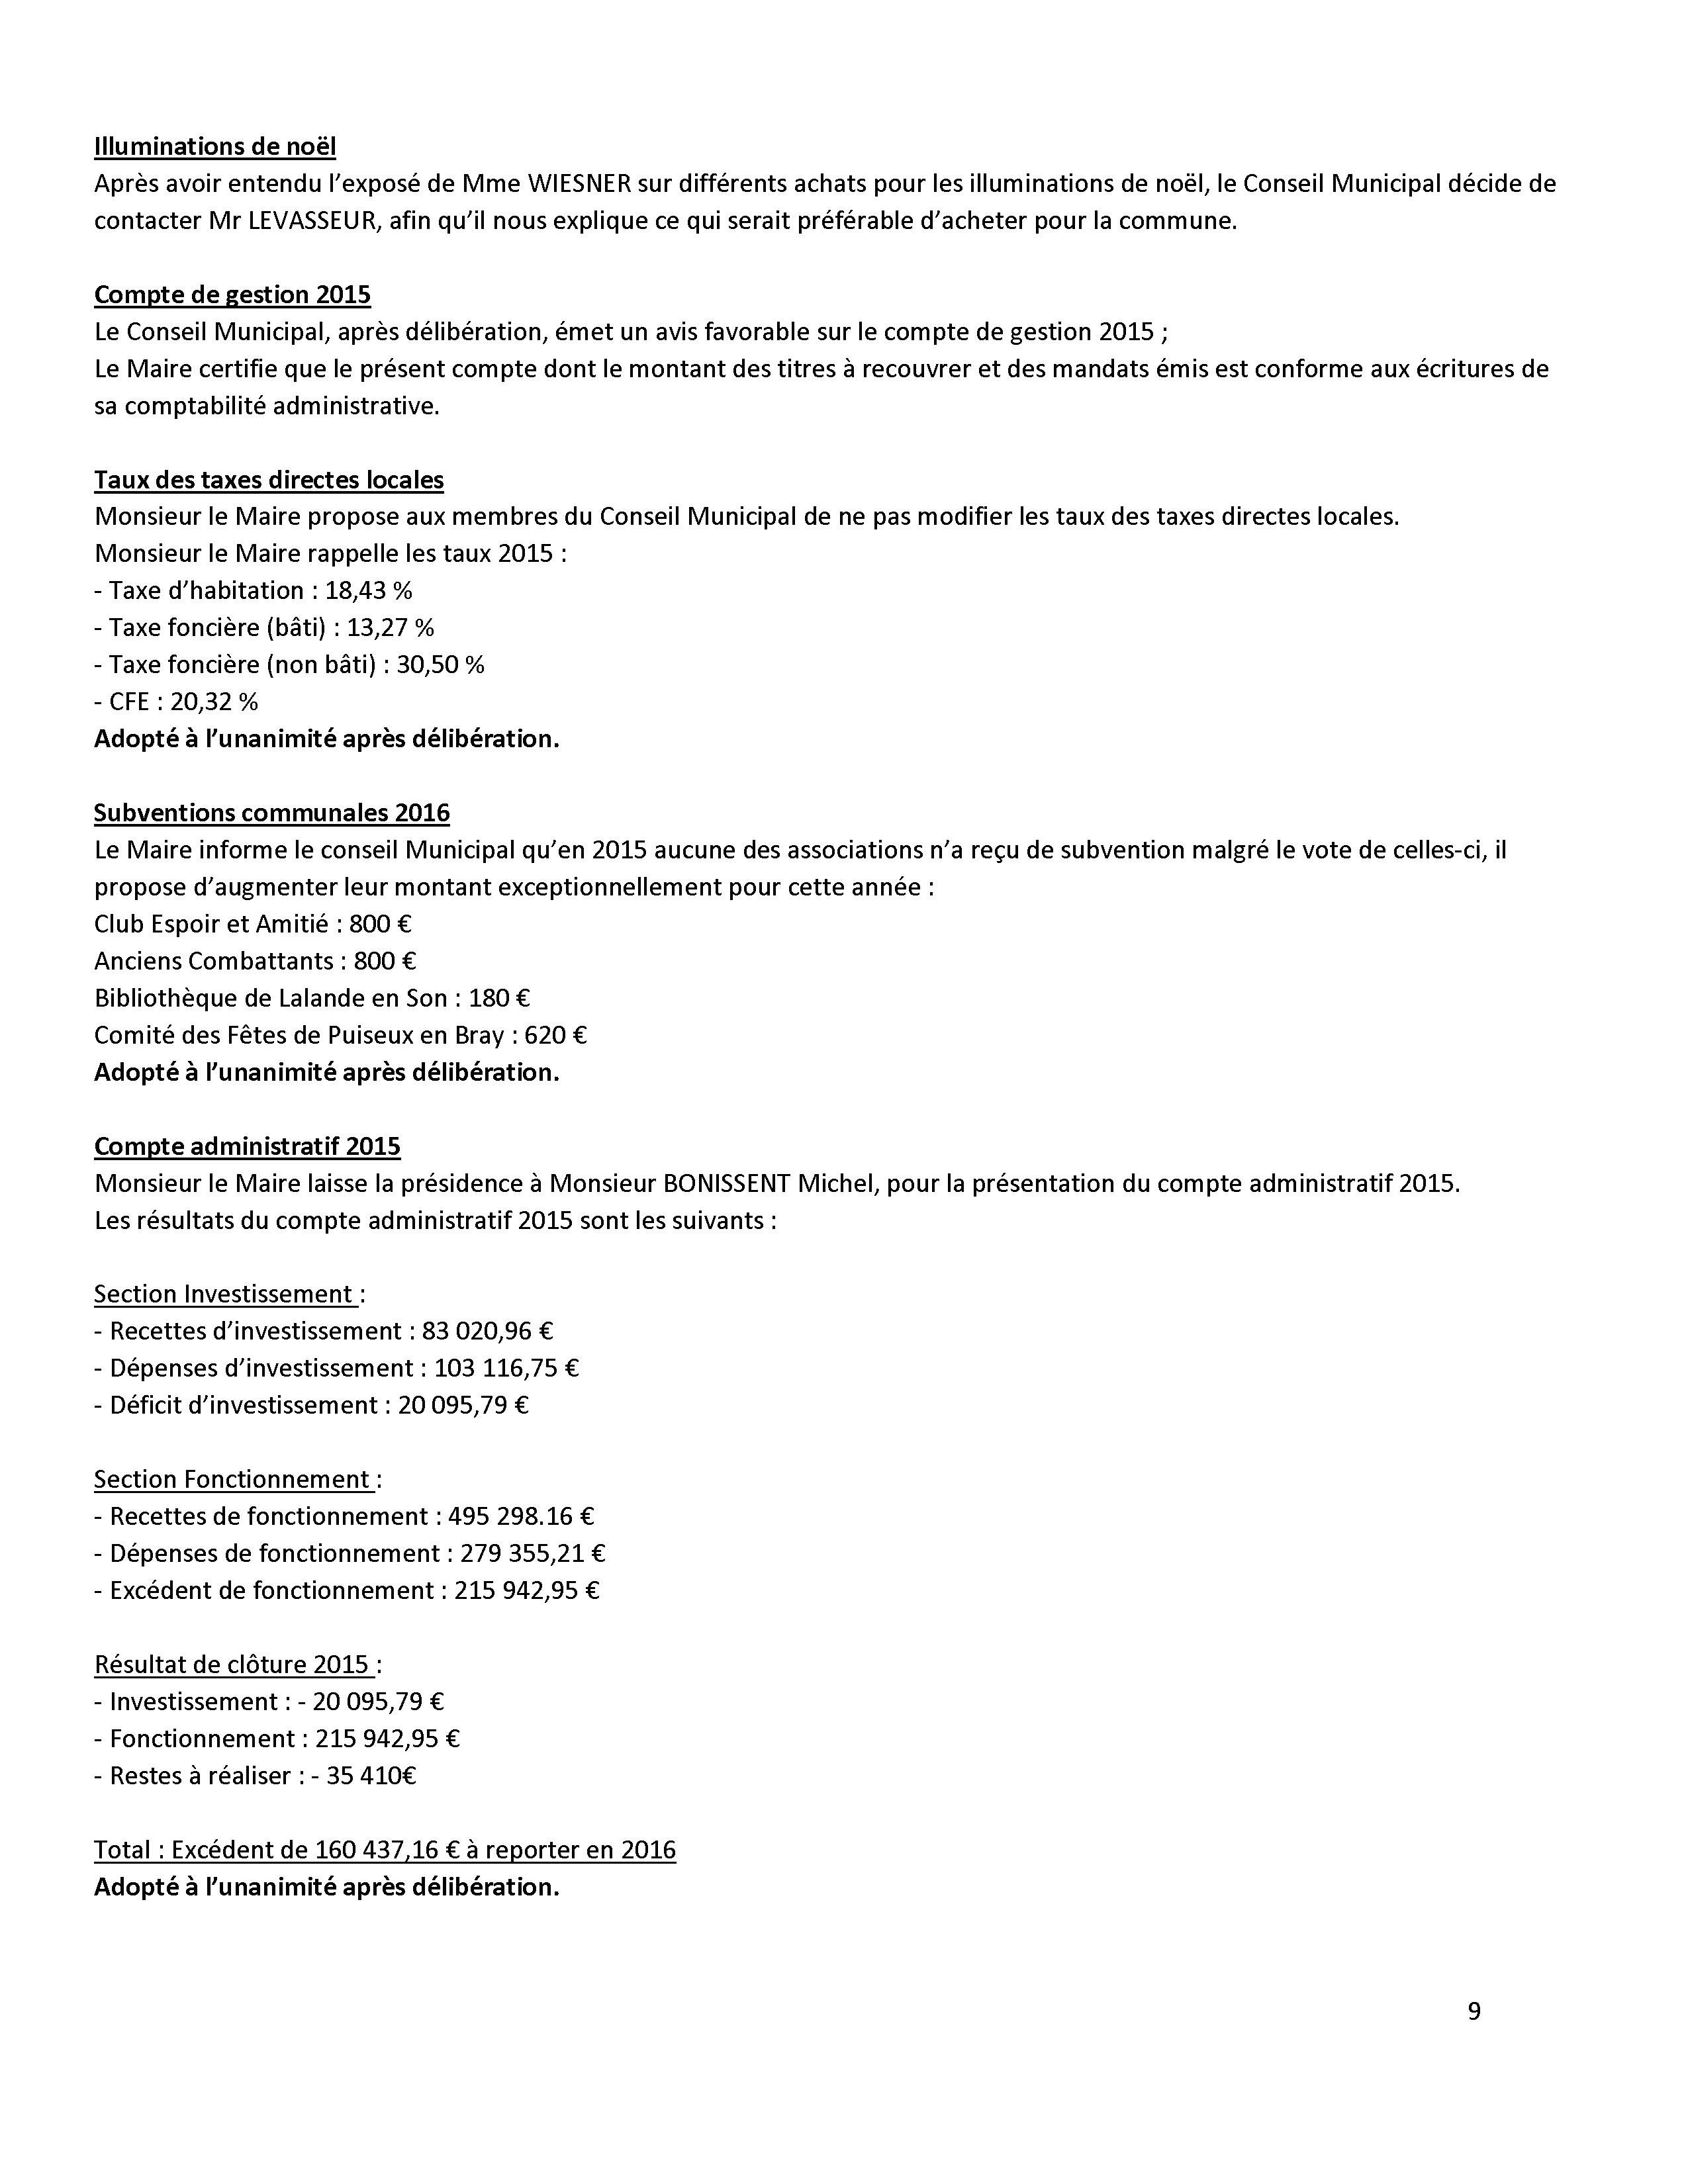 petit-journal-9